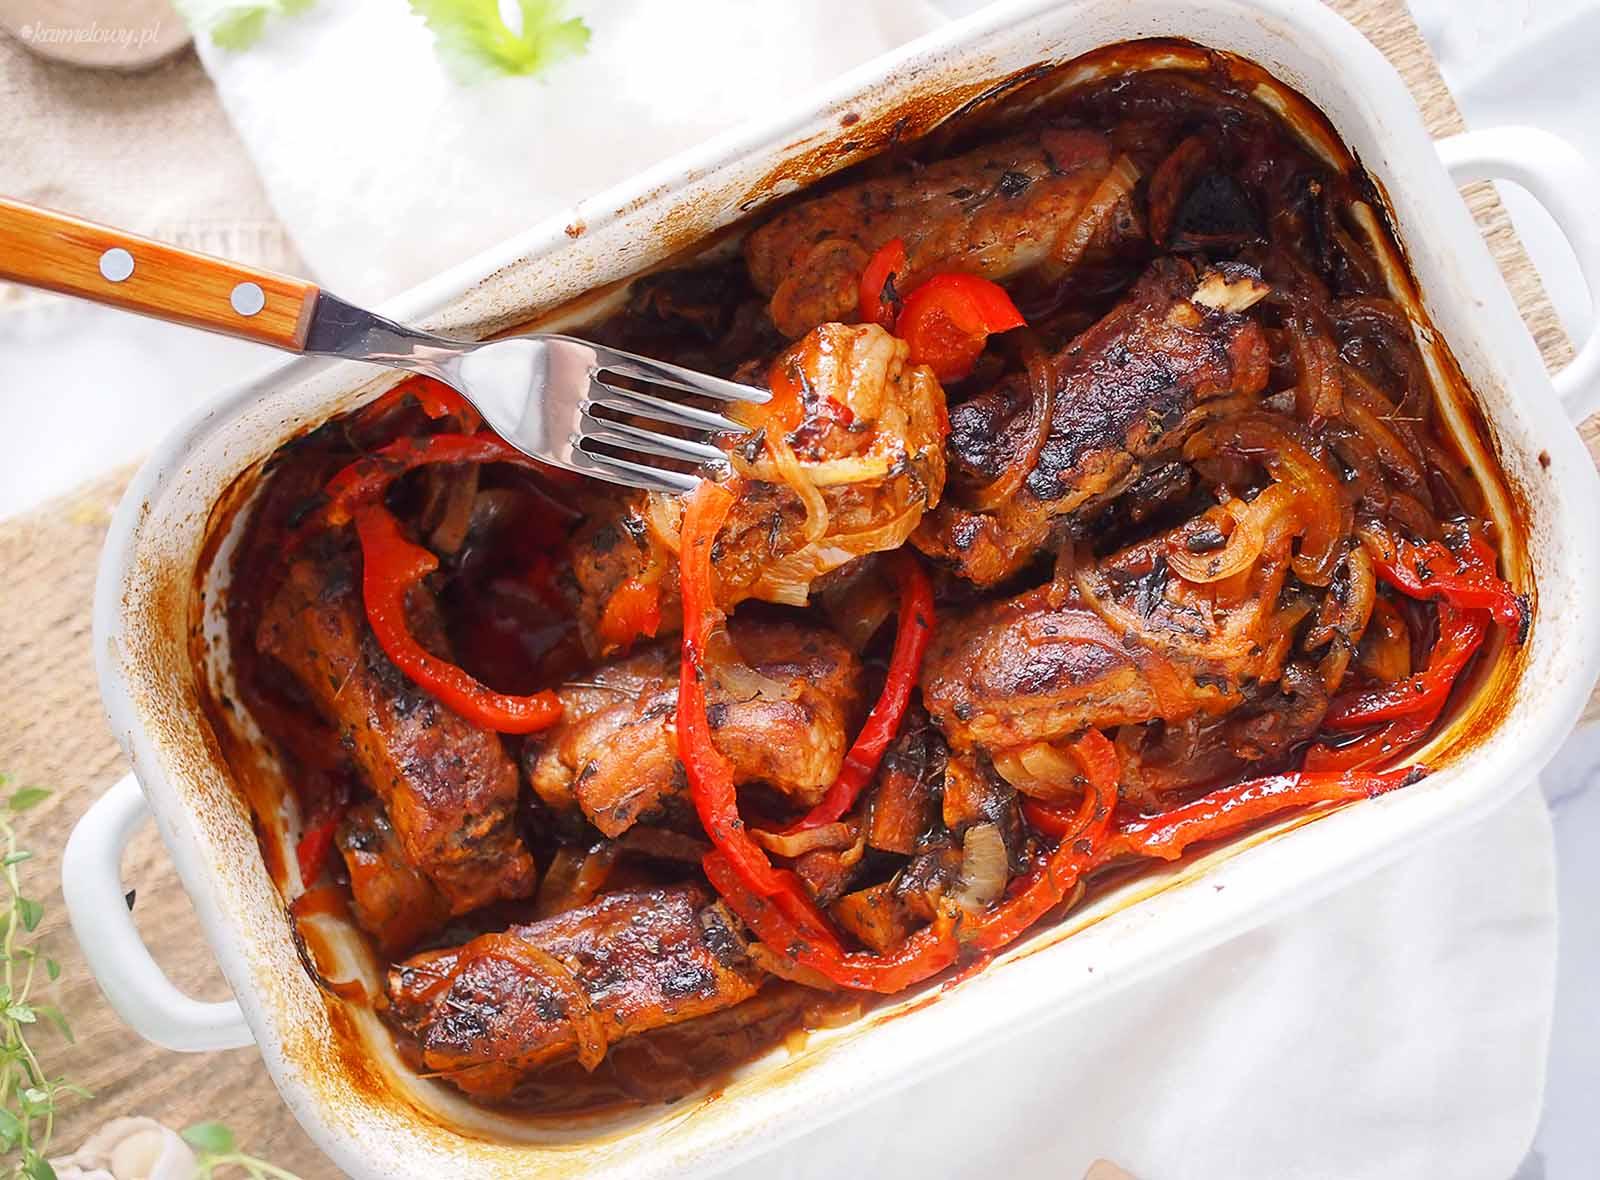 zeberka-pieczone-z-grzybami-i-papryka-Baked-ribs-with-mushrooms-and-bell-pepper